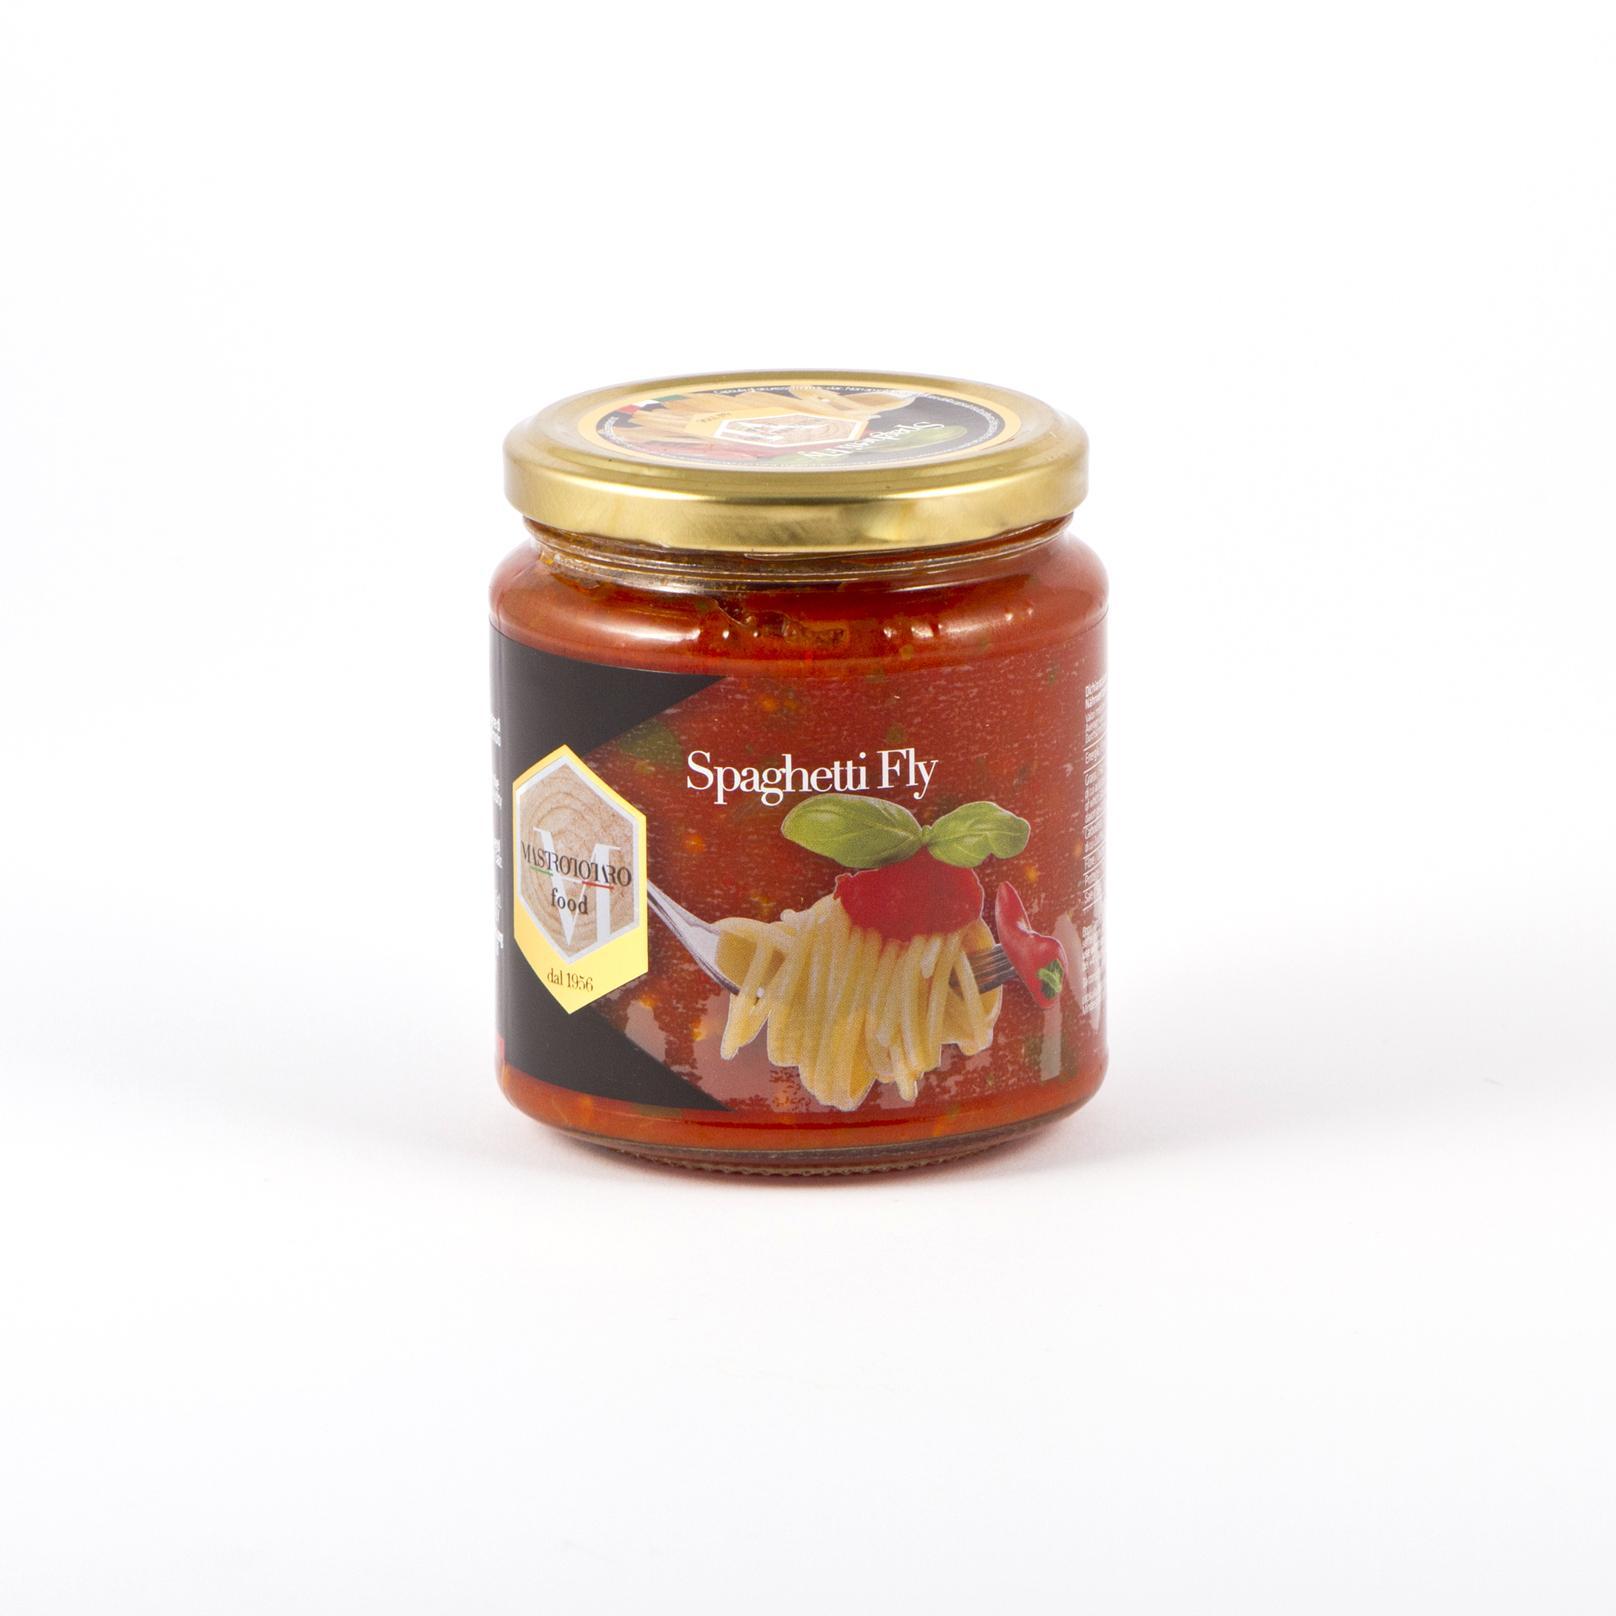 Ready spicy tomato sauce Spaghetti Fly